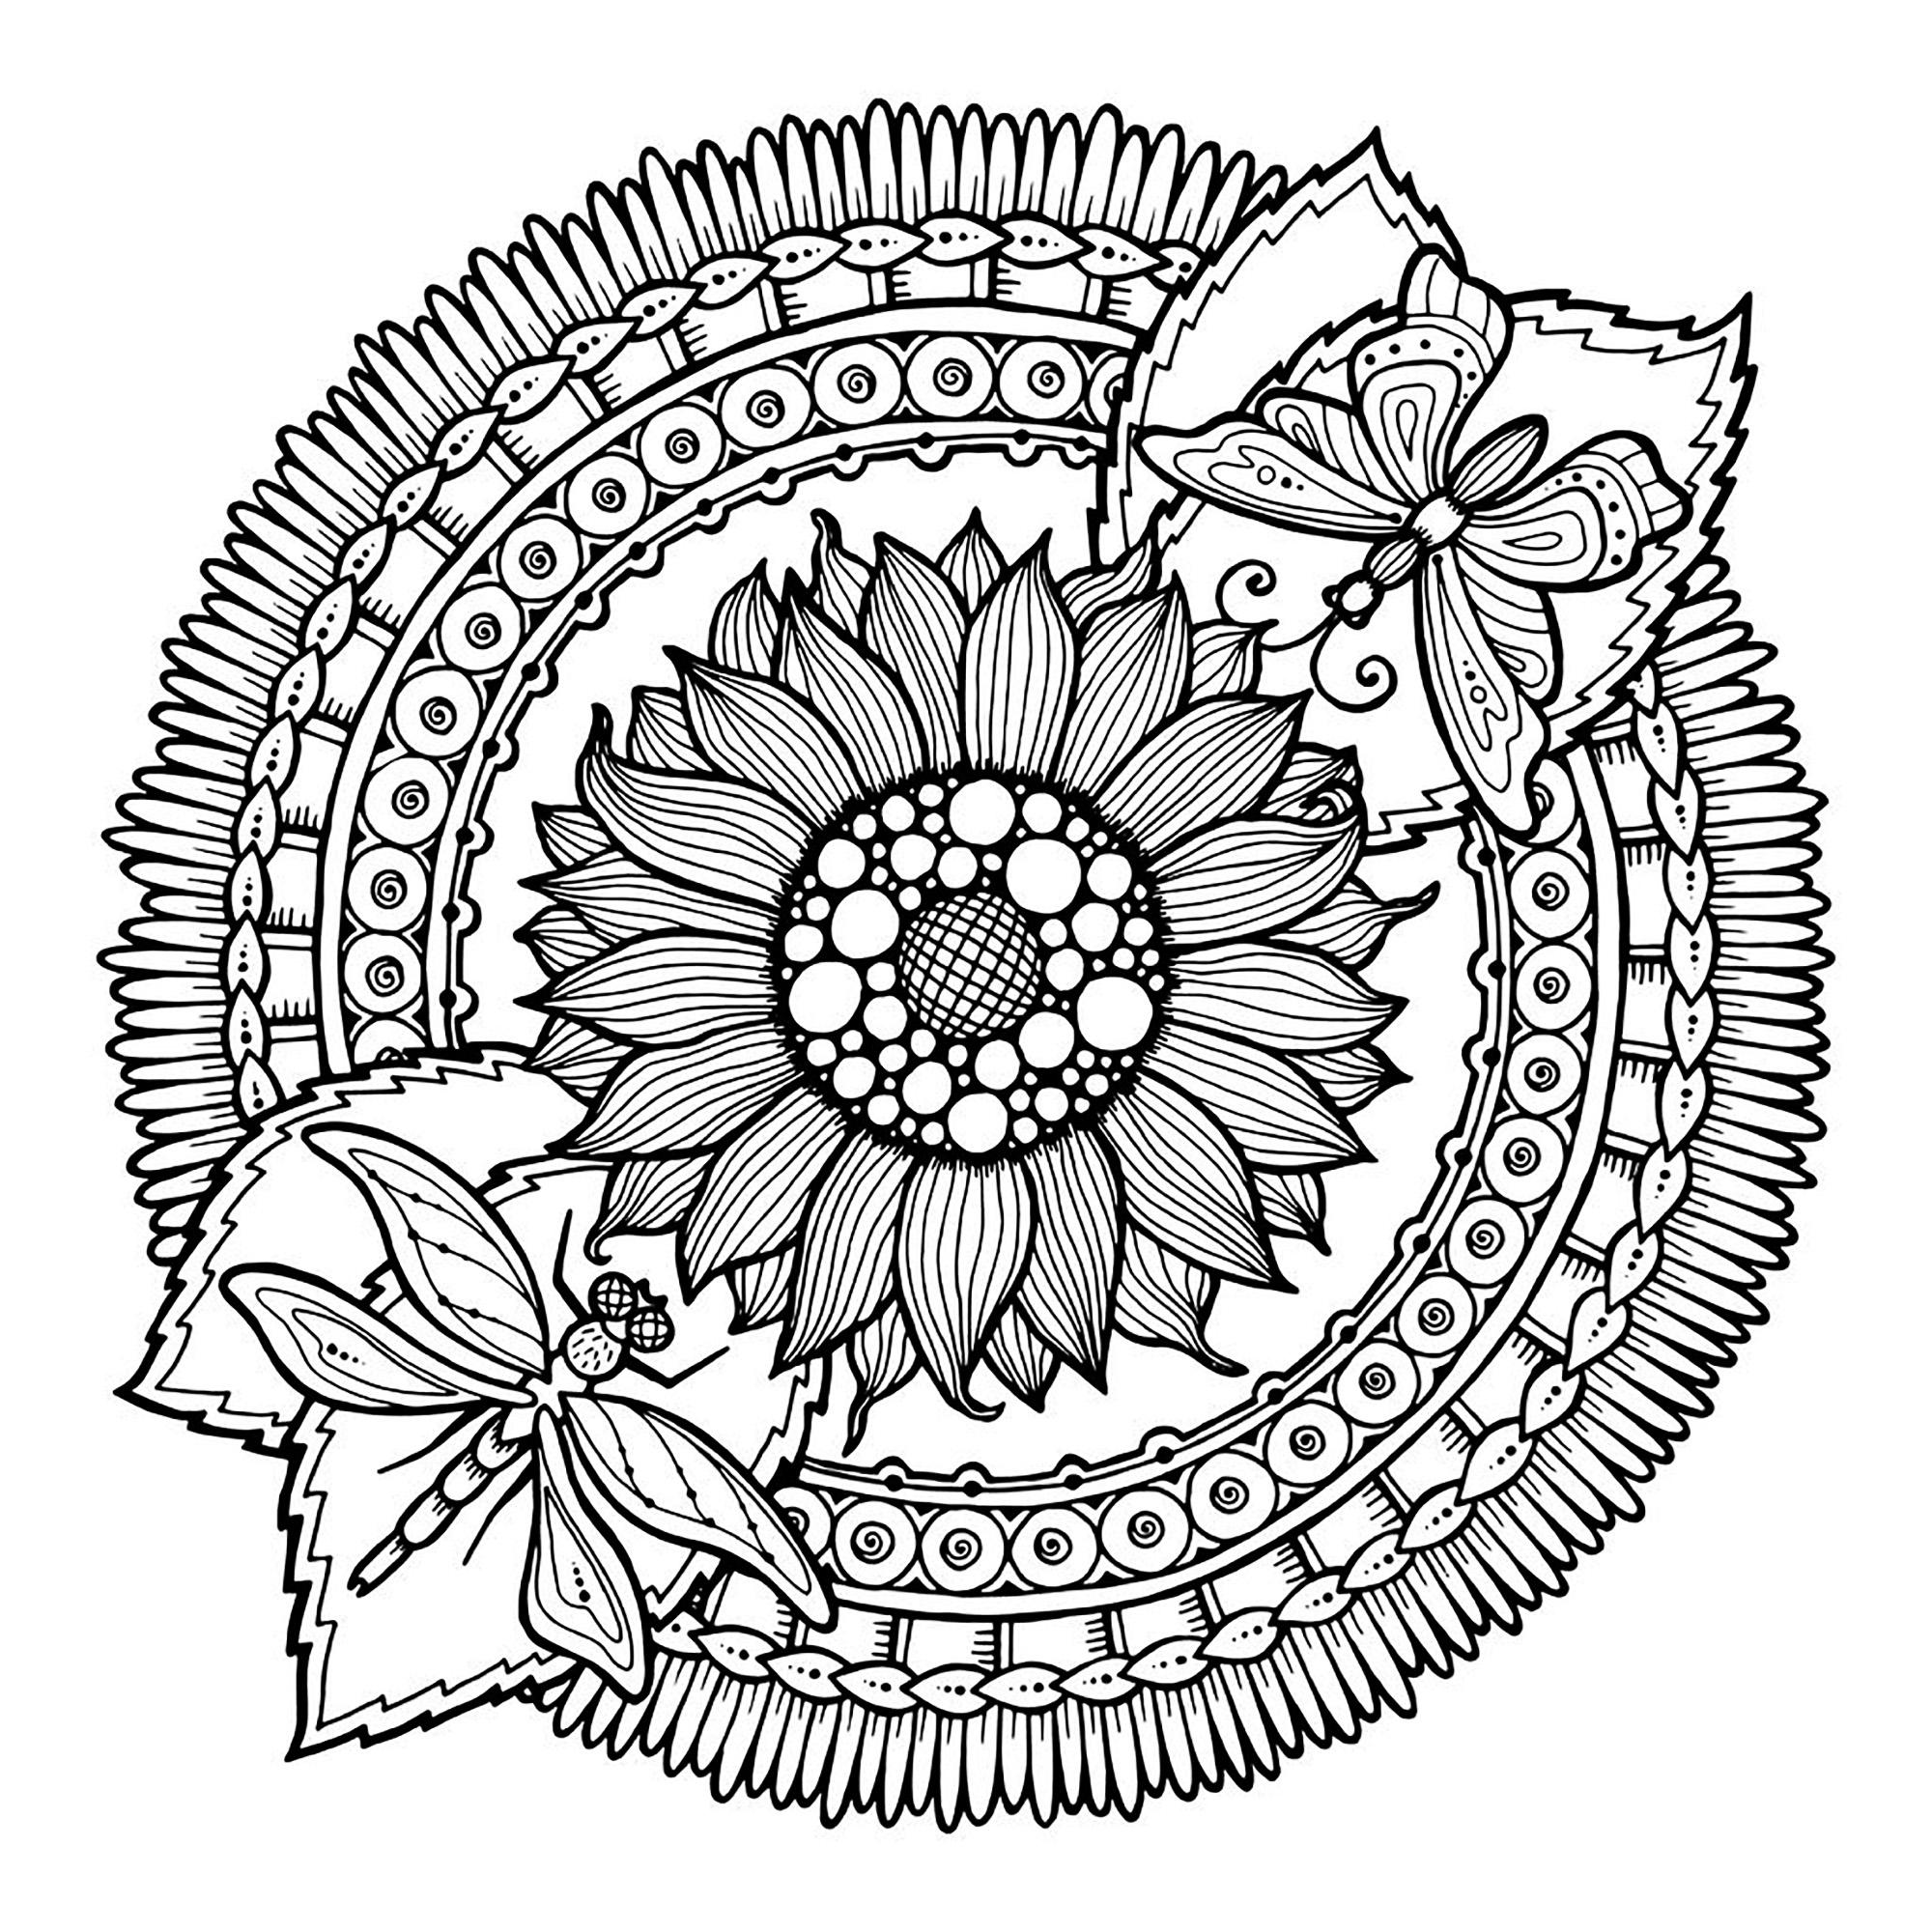 Mandala Libellules et fleursA partir de la galerie : MandalasArtiste : Julias Negireva, Source :  123rf